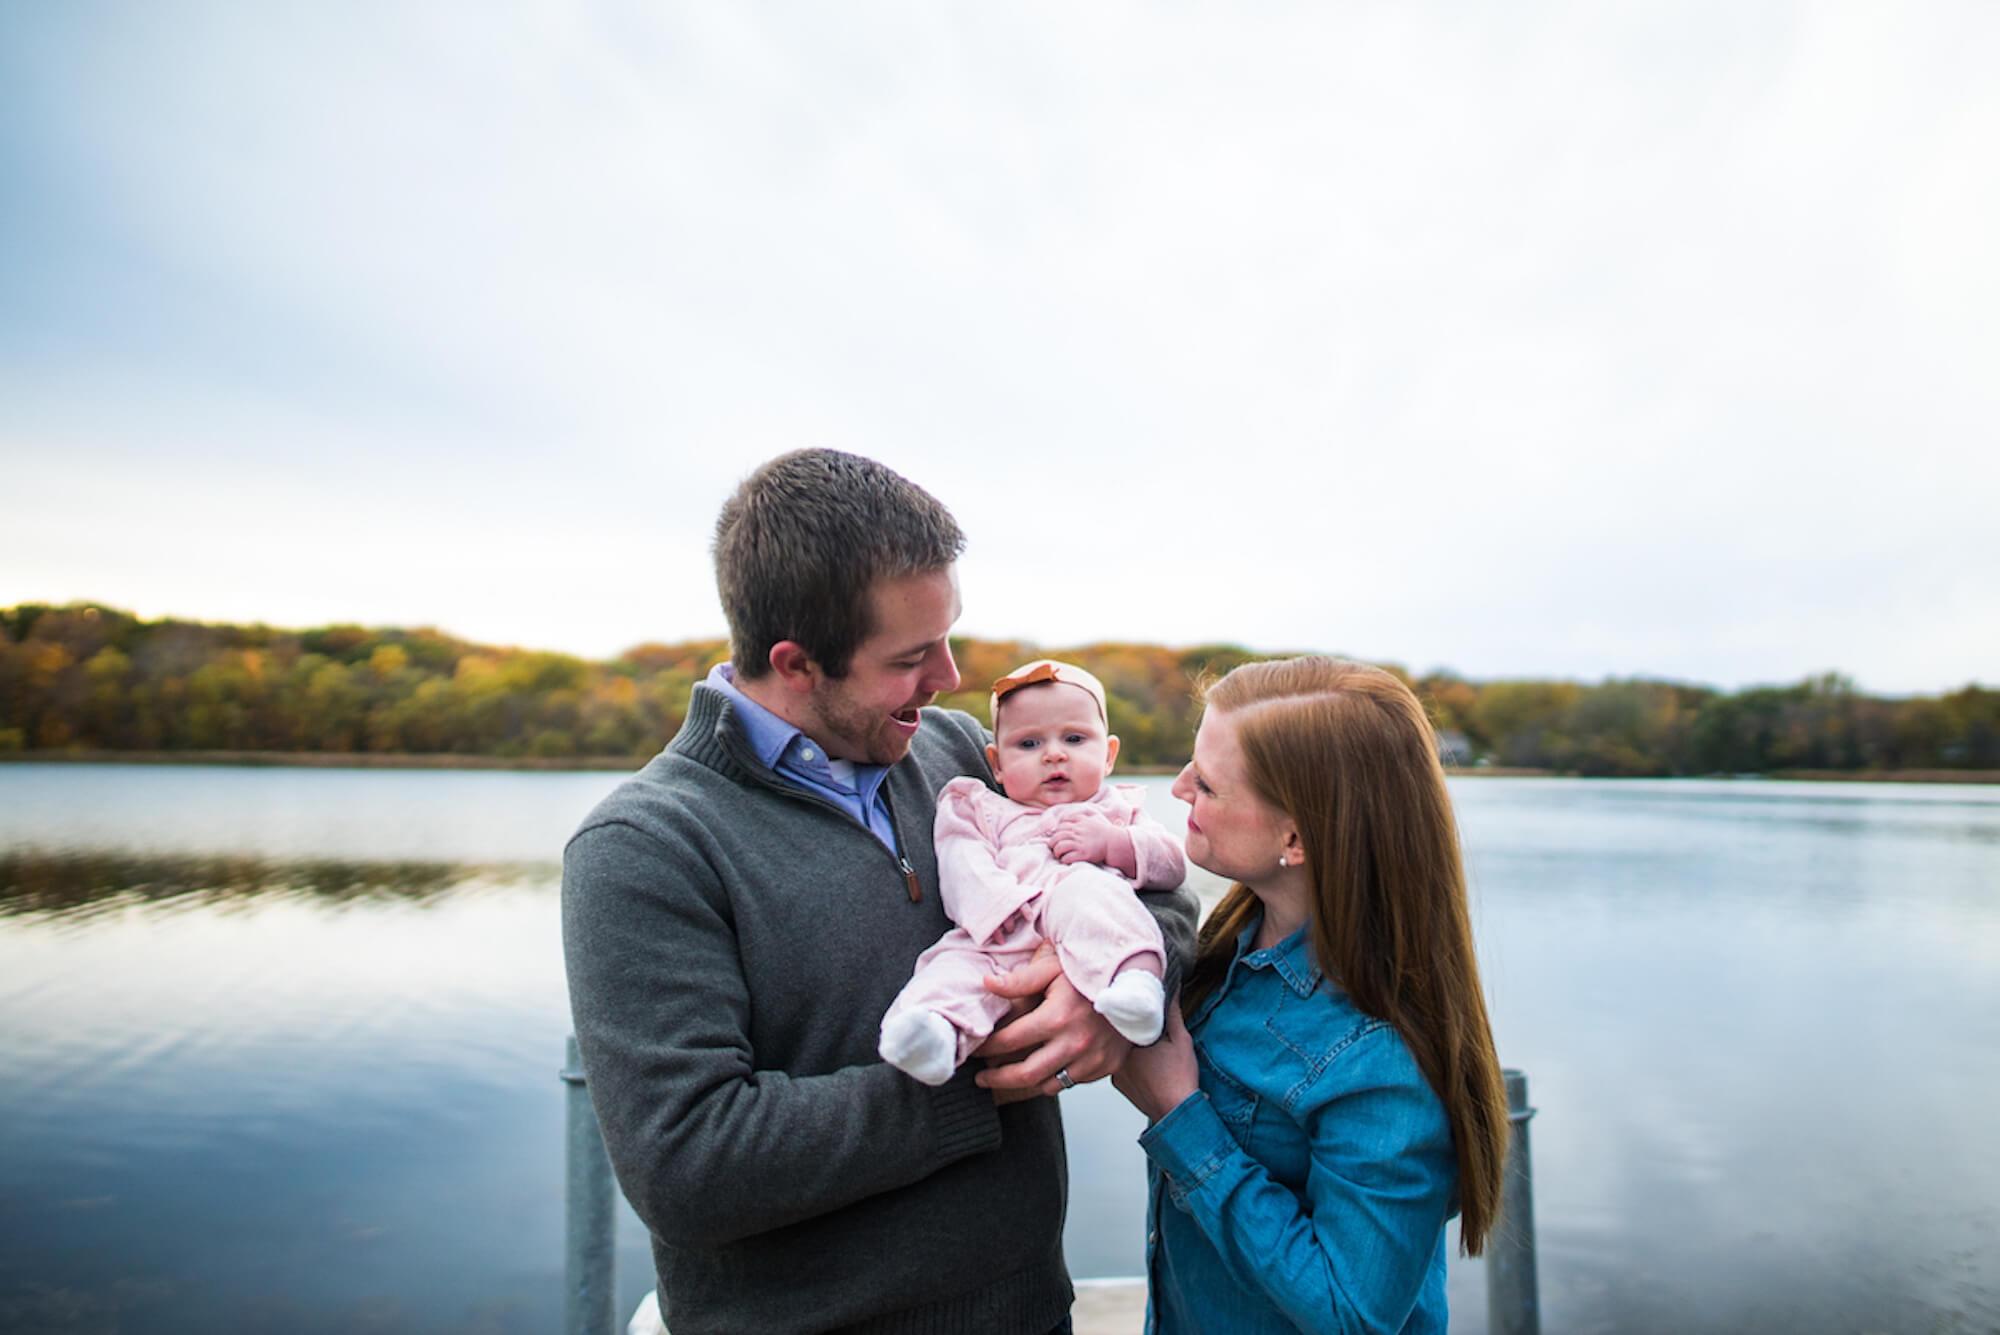 engle-olson-family-photography-session-19.jpg